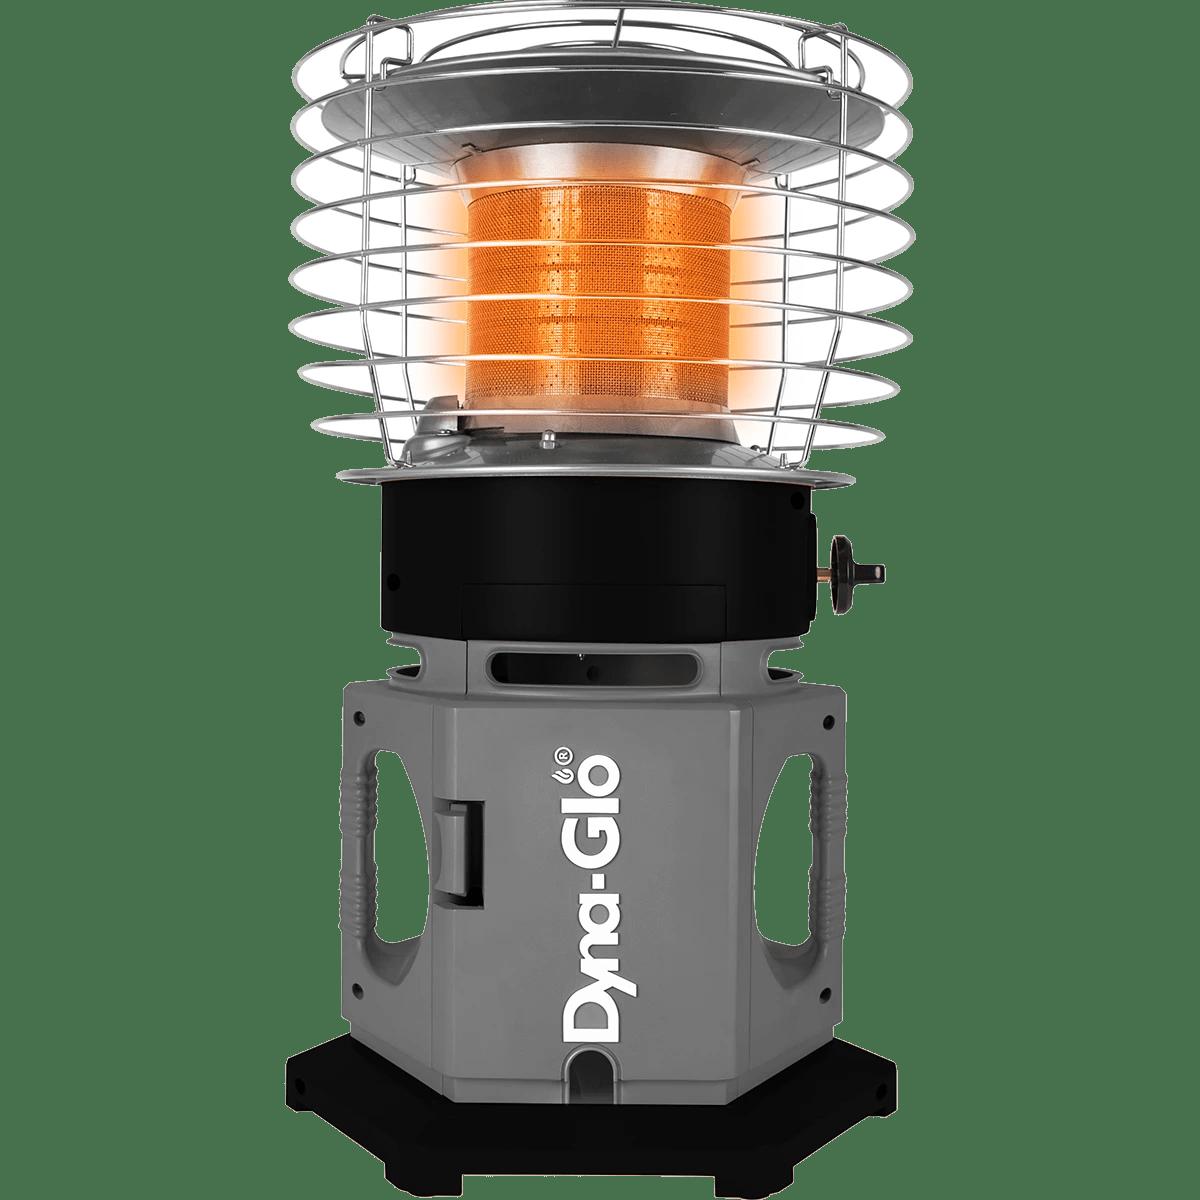 dyna glo heataround 360 portable propane heater